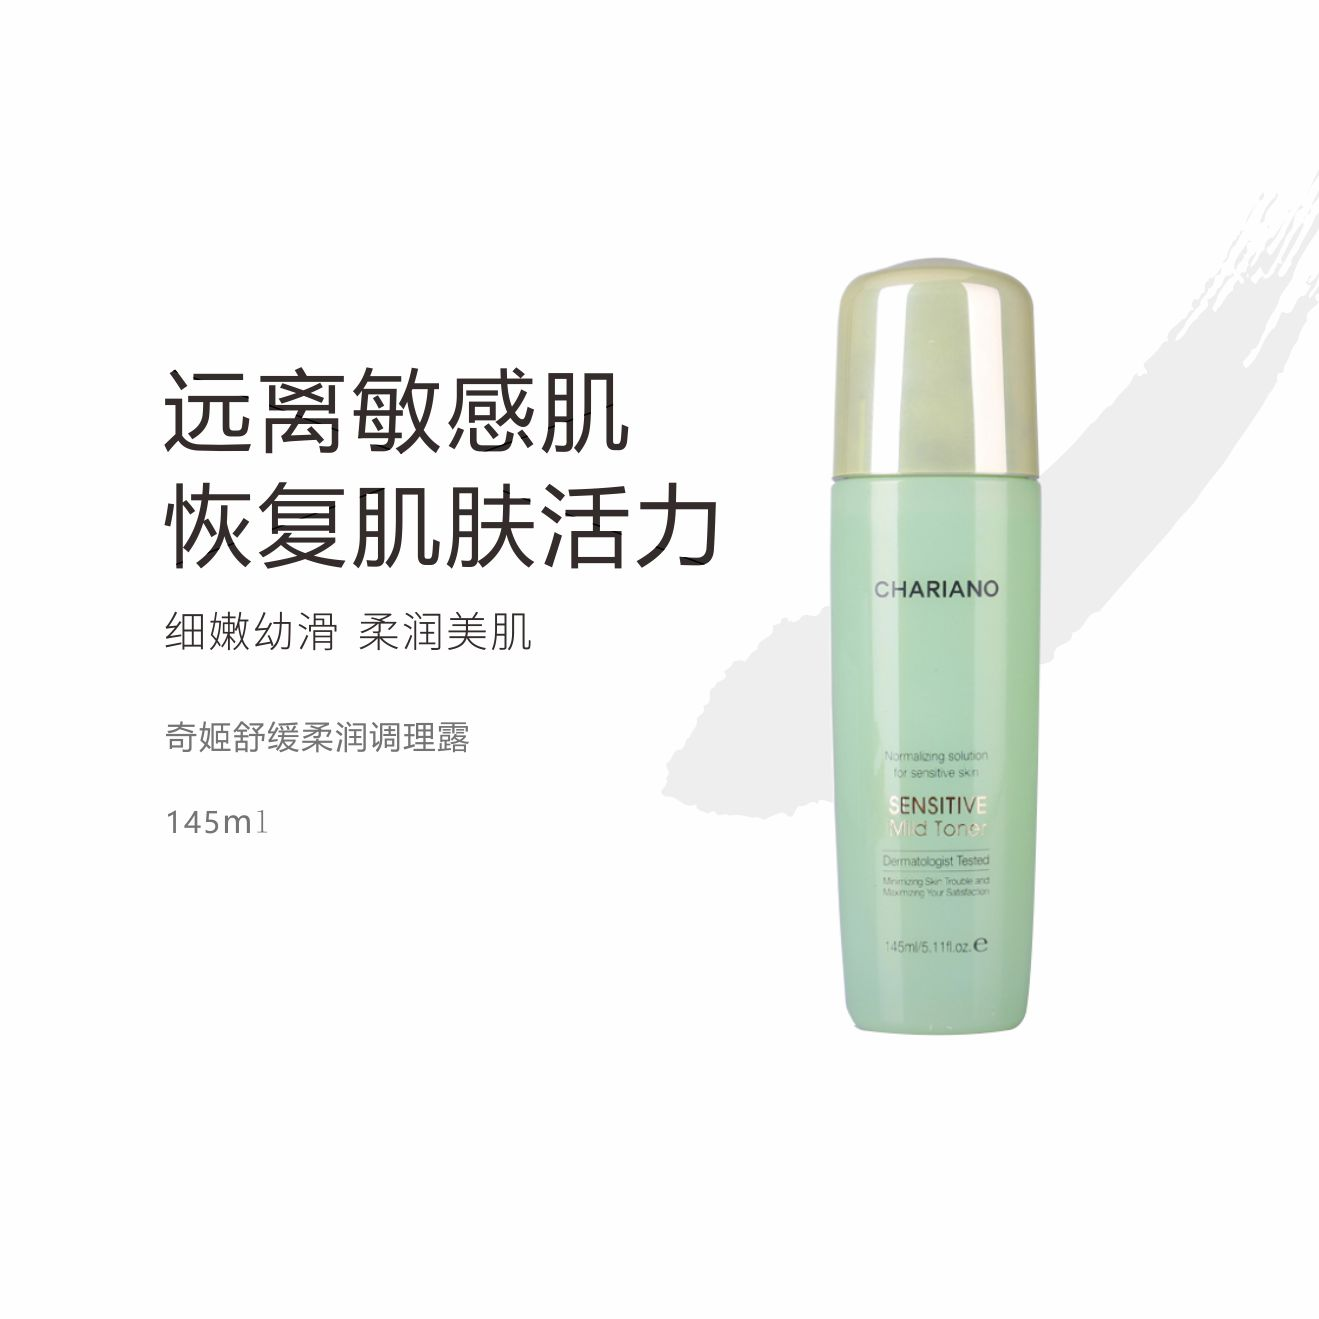 Chariano / Qiji moisturizing sensitive skin conditioning lotion, soothing and moisturizing beauty lotion Moisturizer